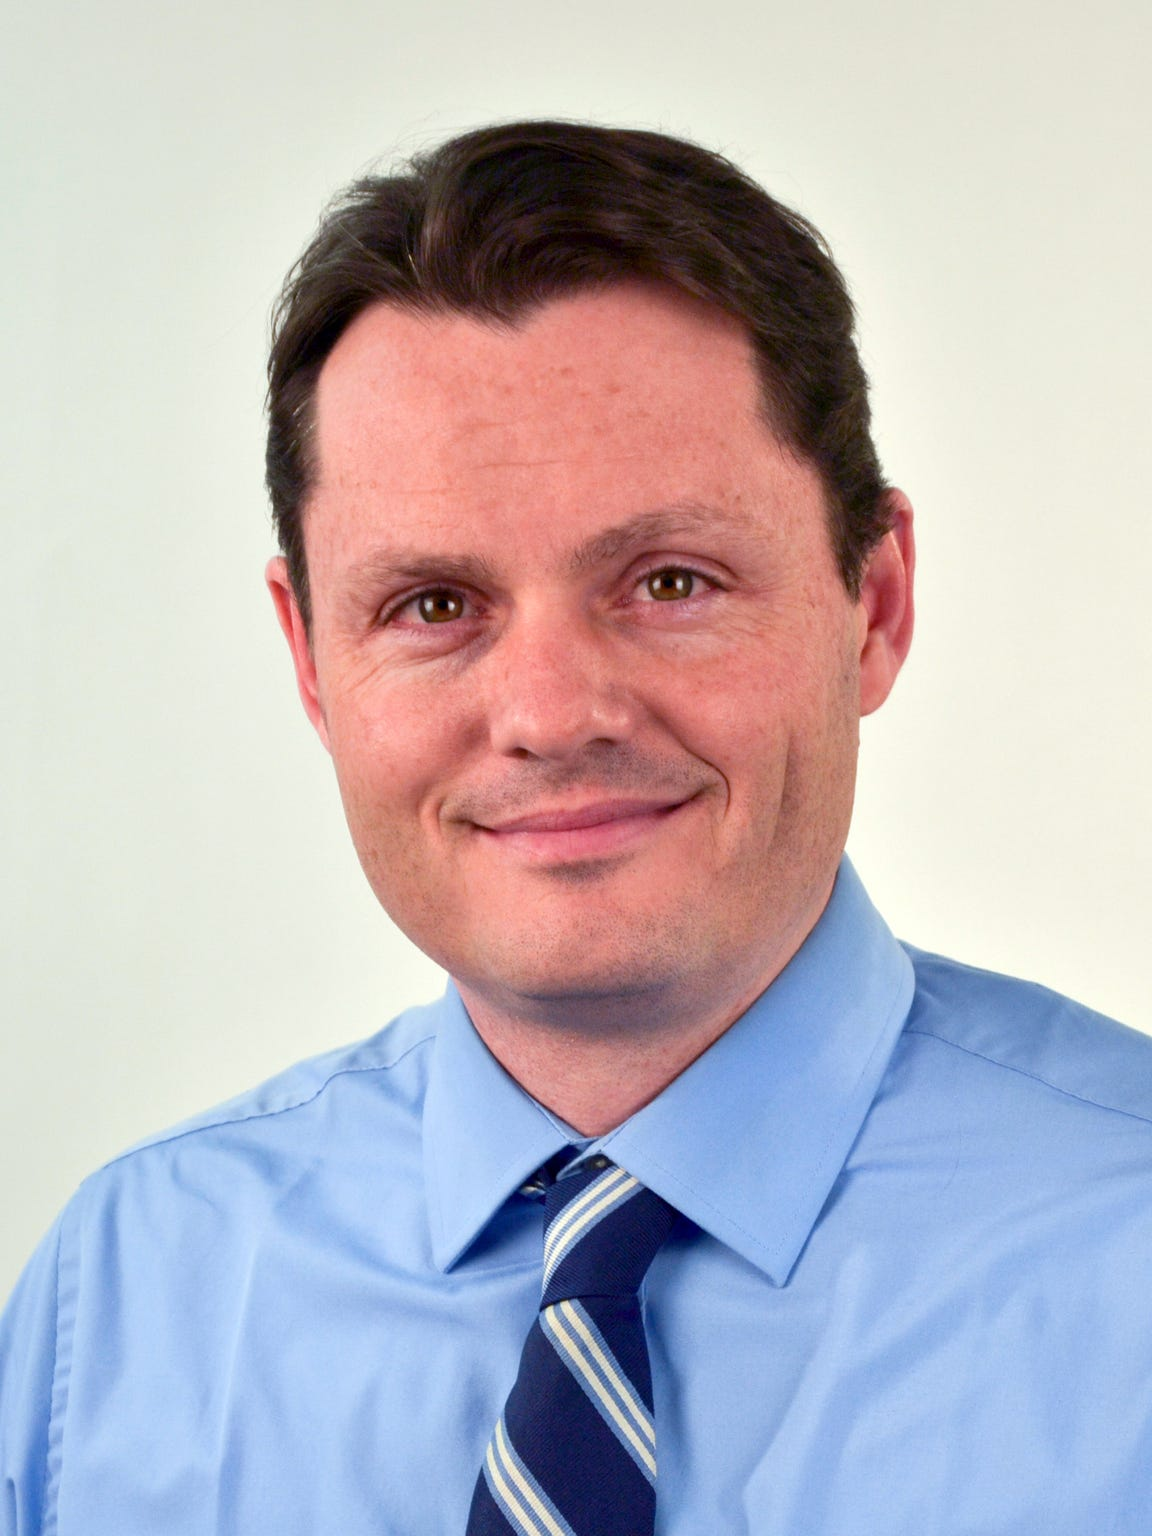 AHCA Secretary Justin Senior